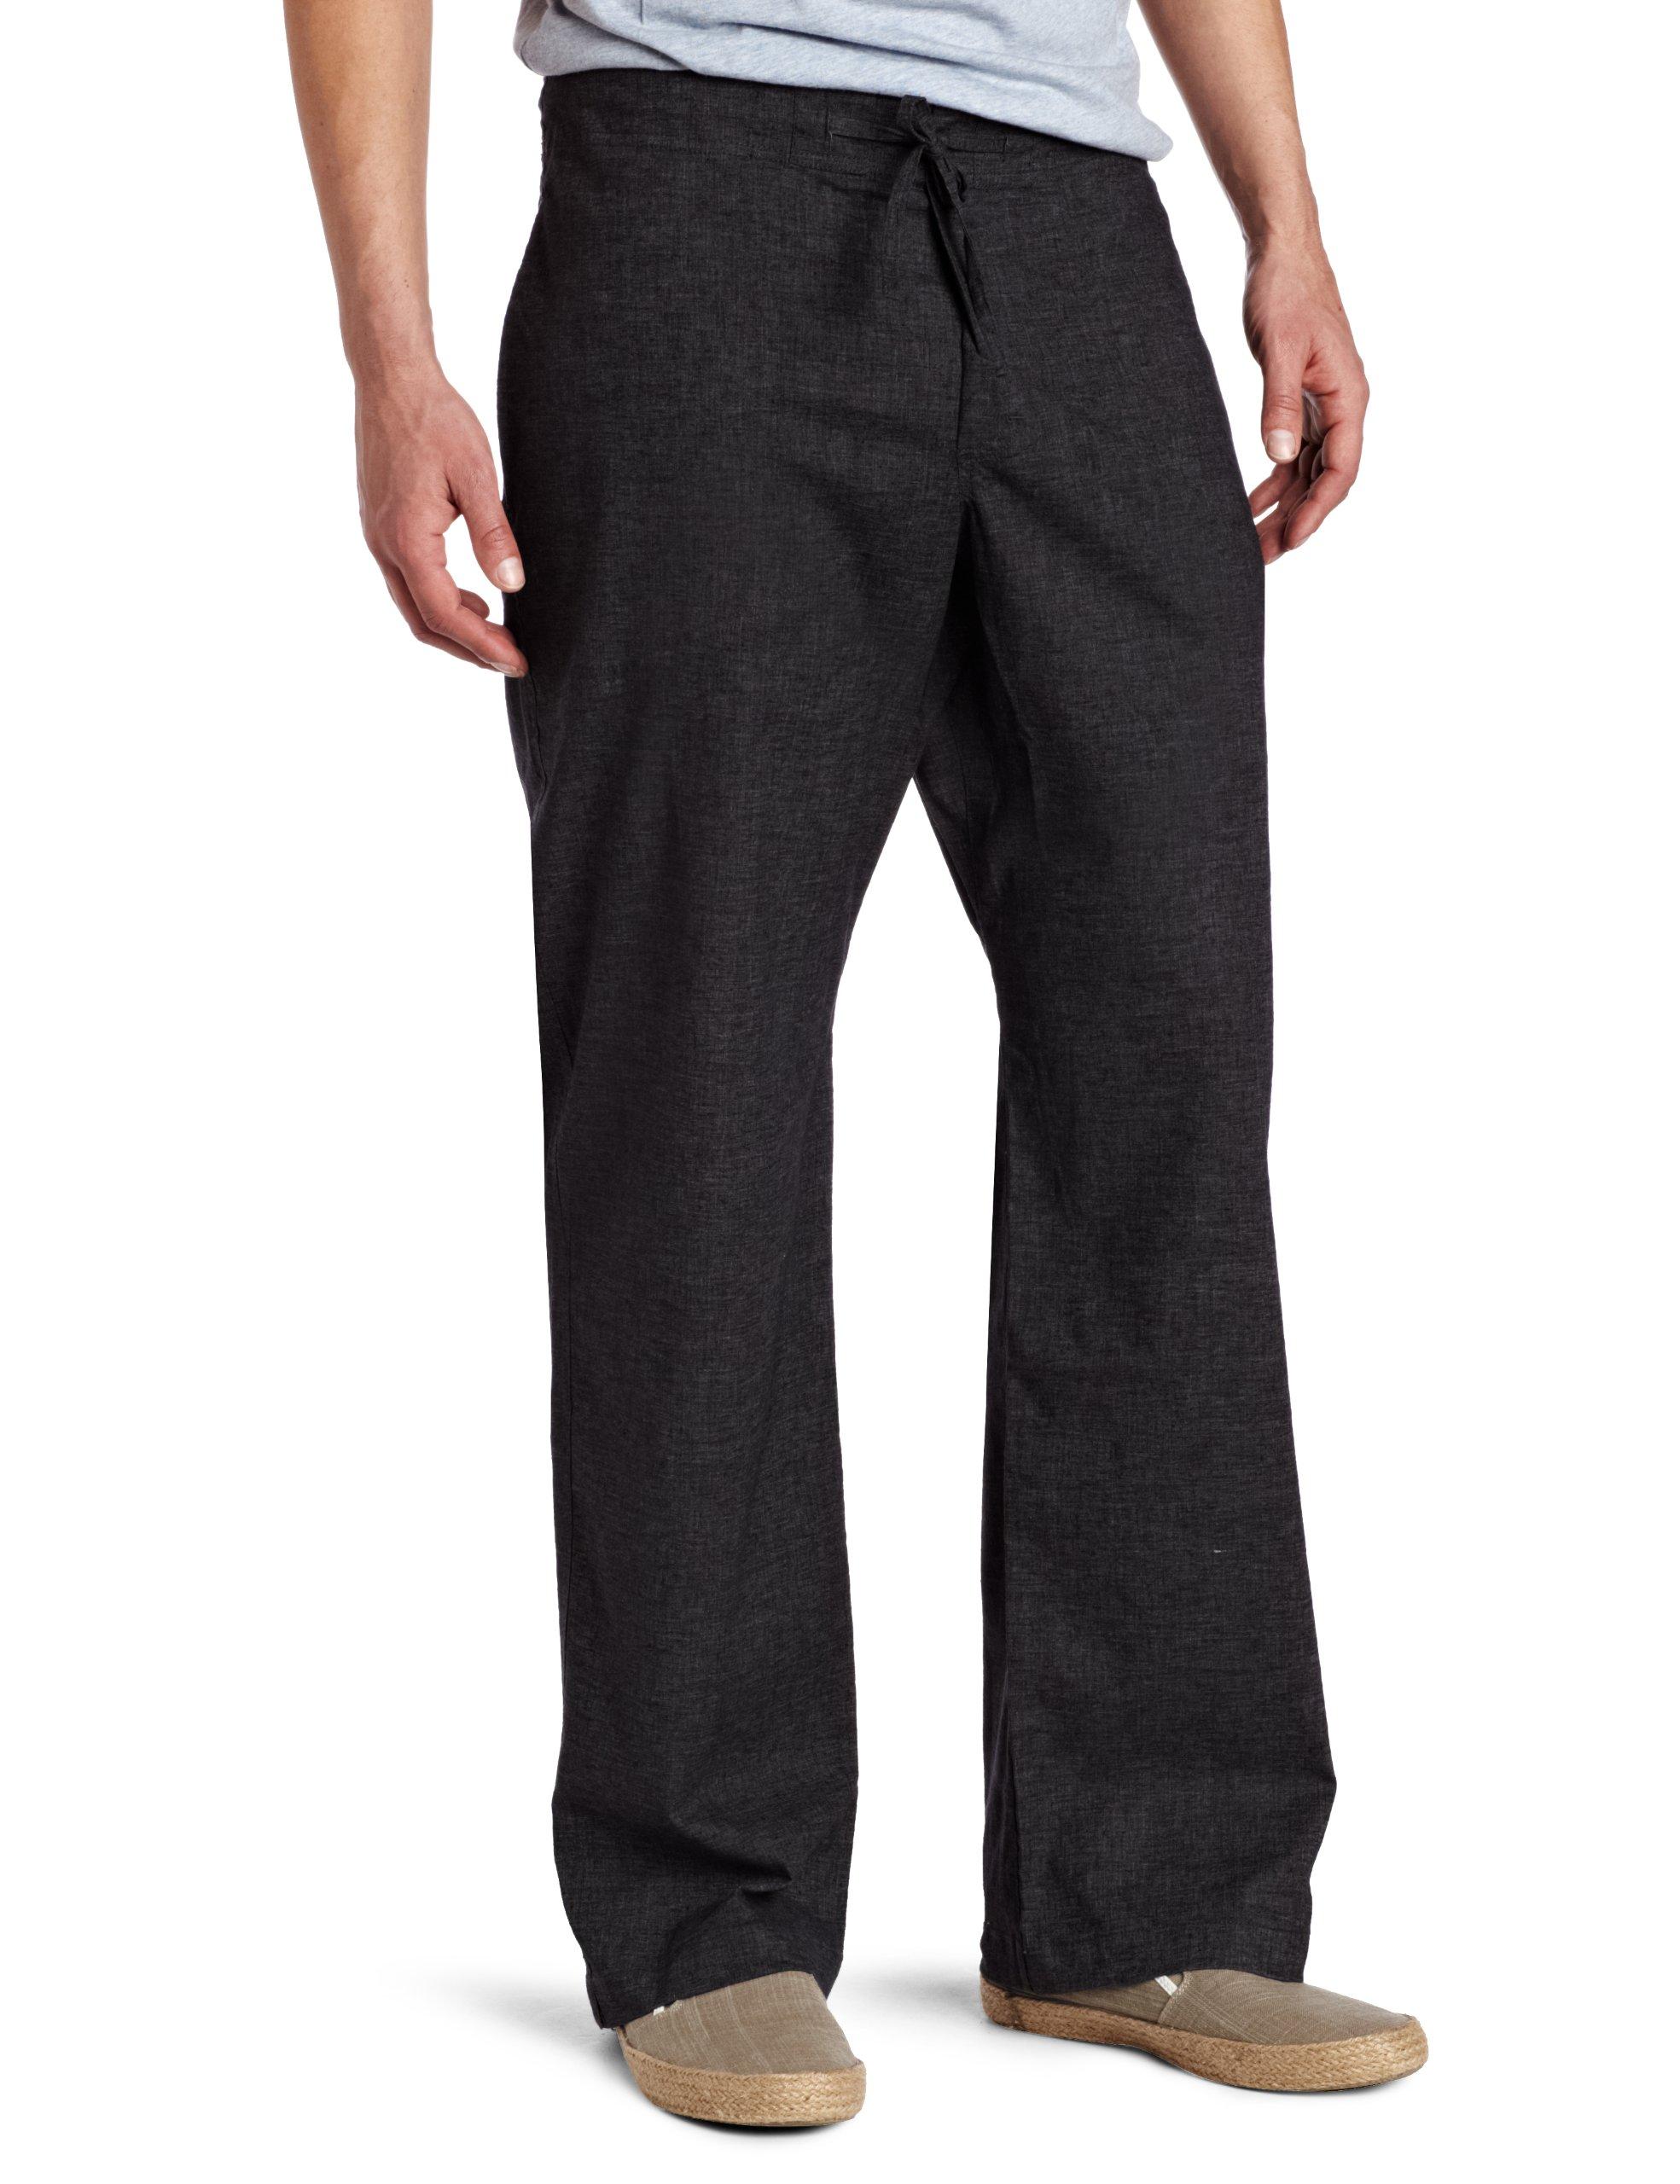 prAna Men's Sutra Pant (Black, X-Small)